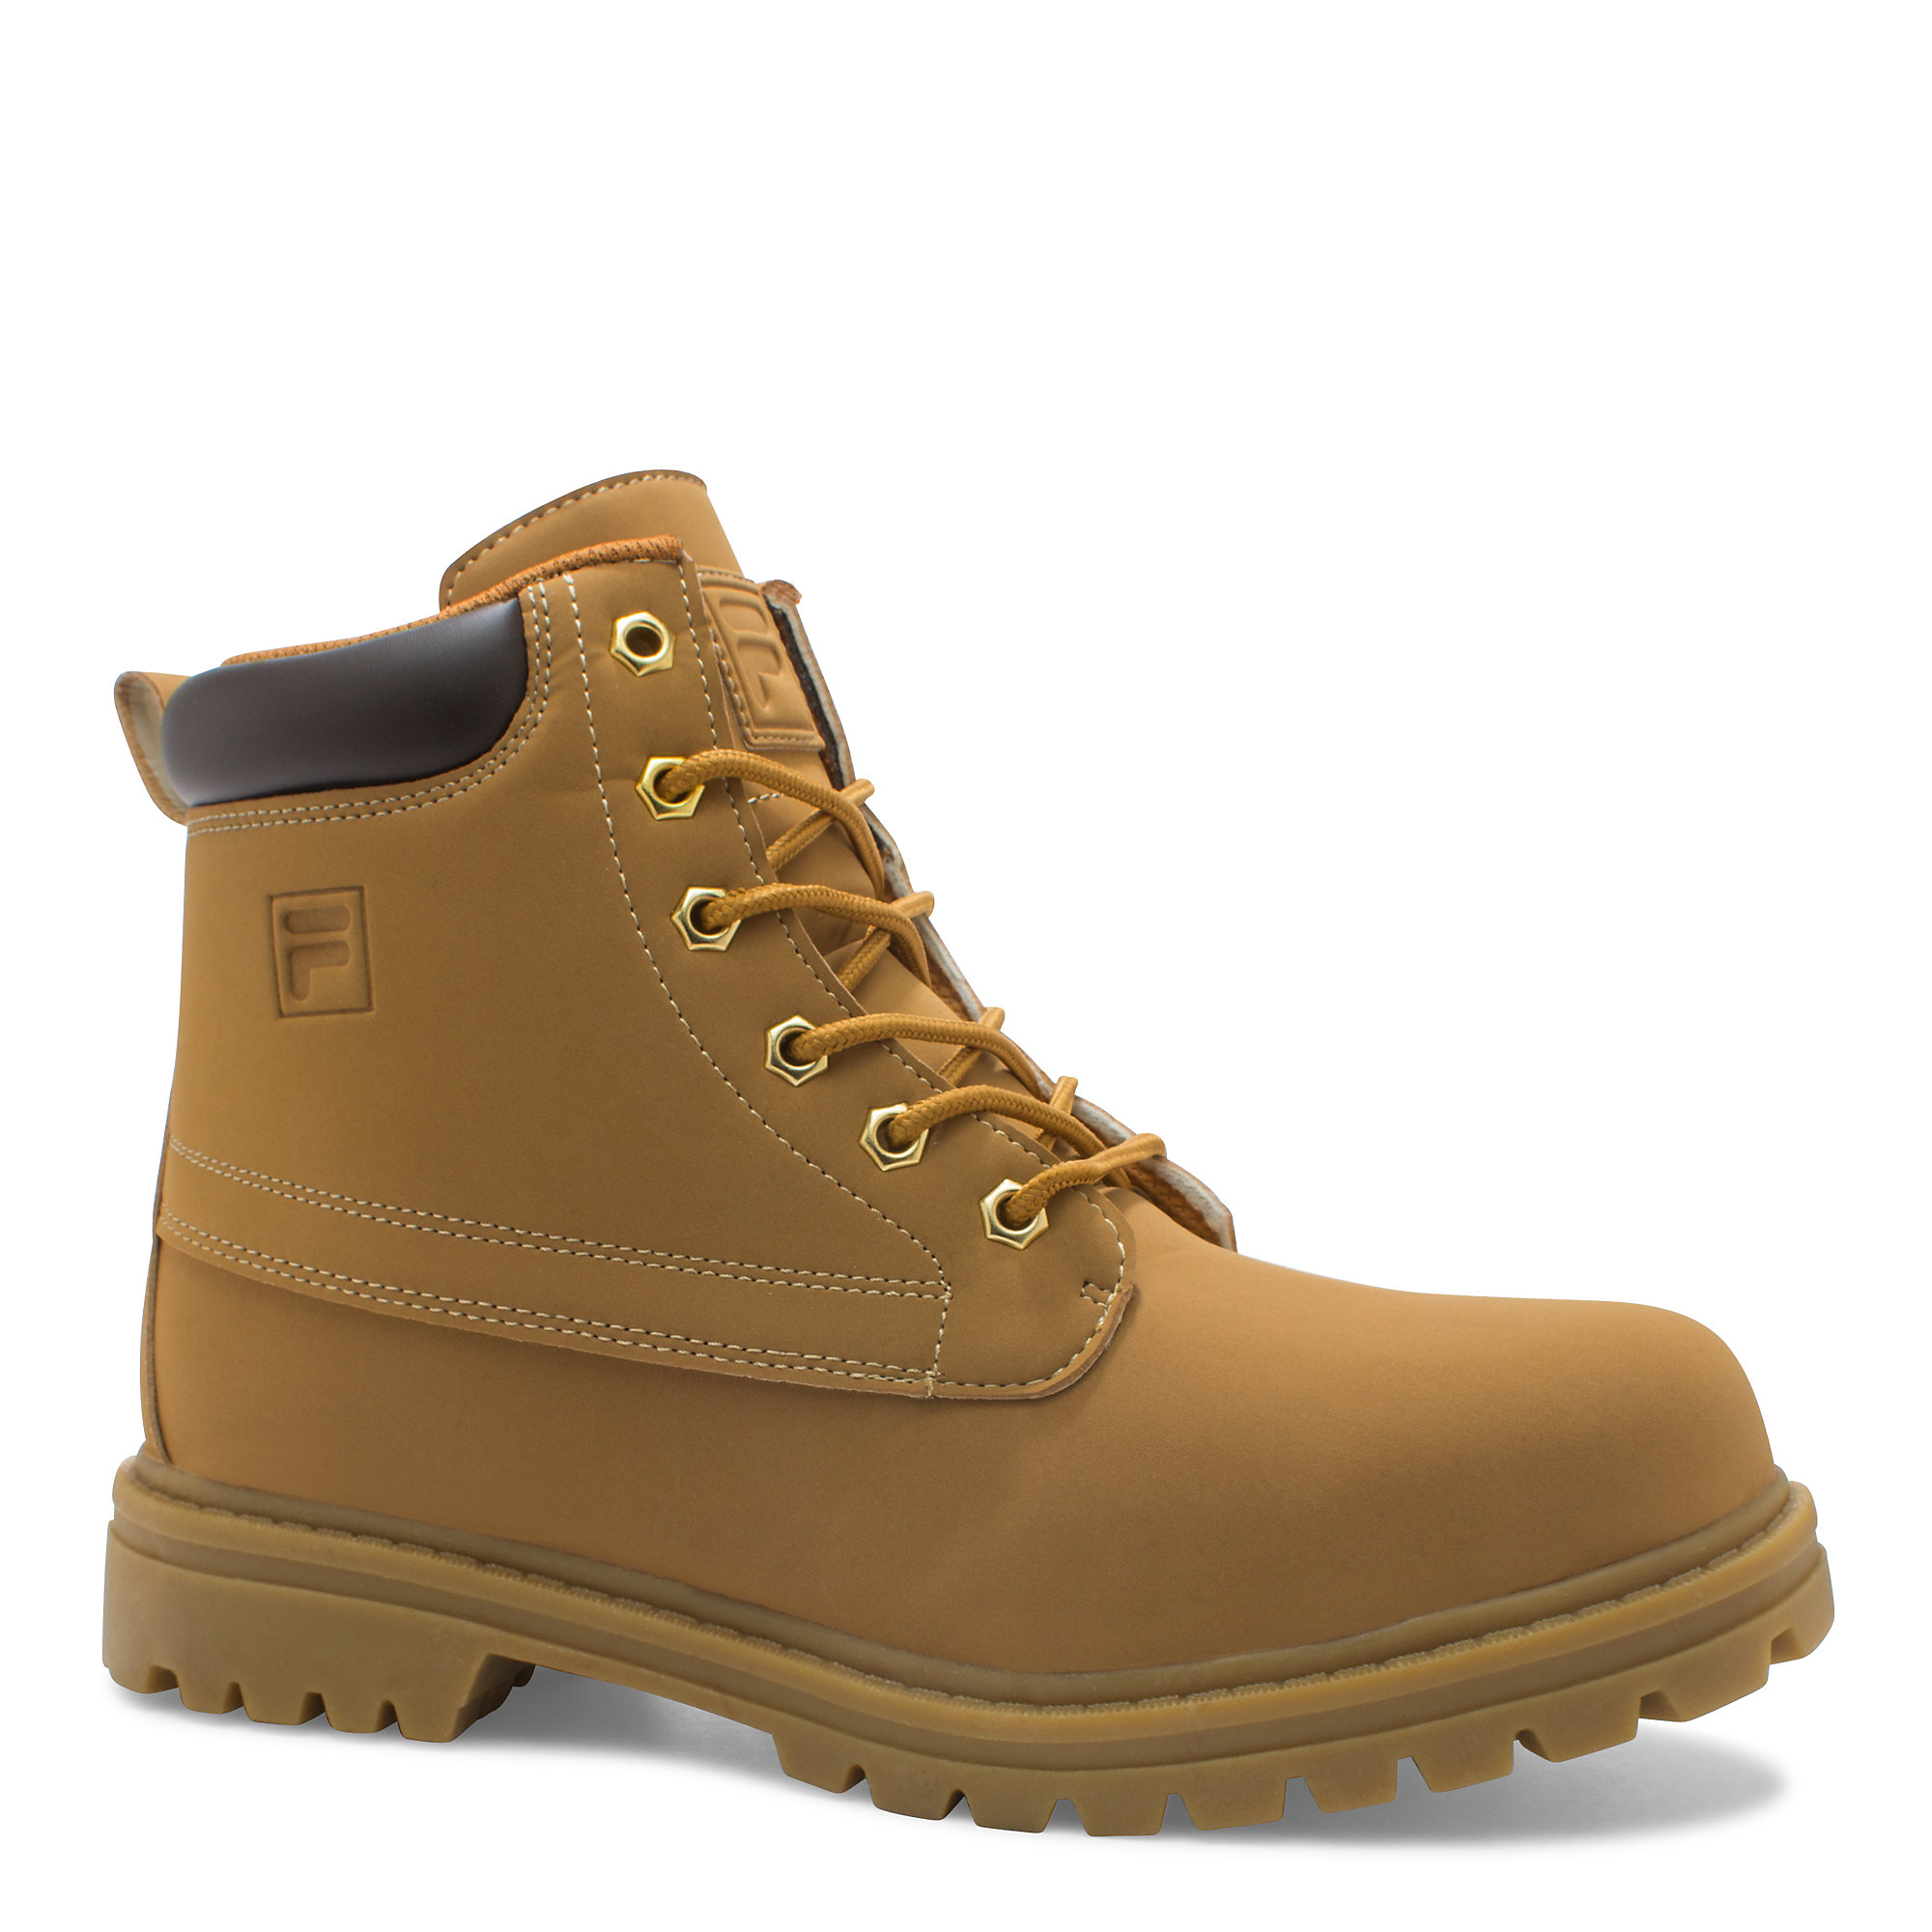 FILA Men's Edgewater Boots | eBay